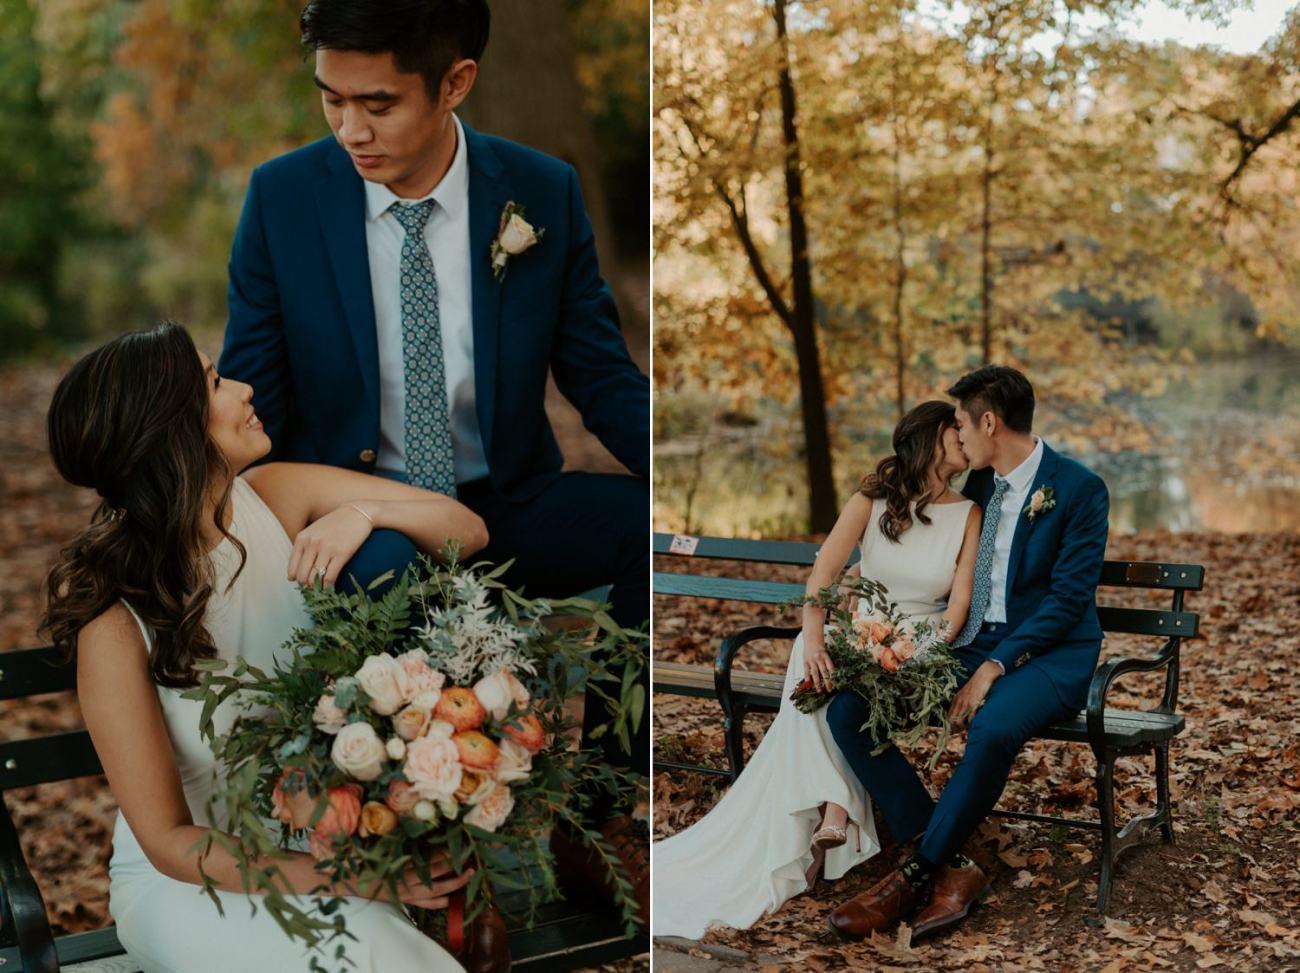 Prospect Park Brooklyn Wedding Fall Wedding In NYC New York Wedding Photographer Anais Possamai Photography 17